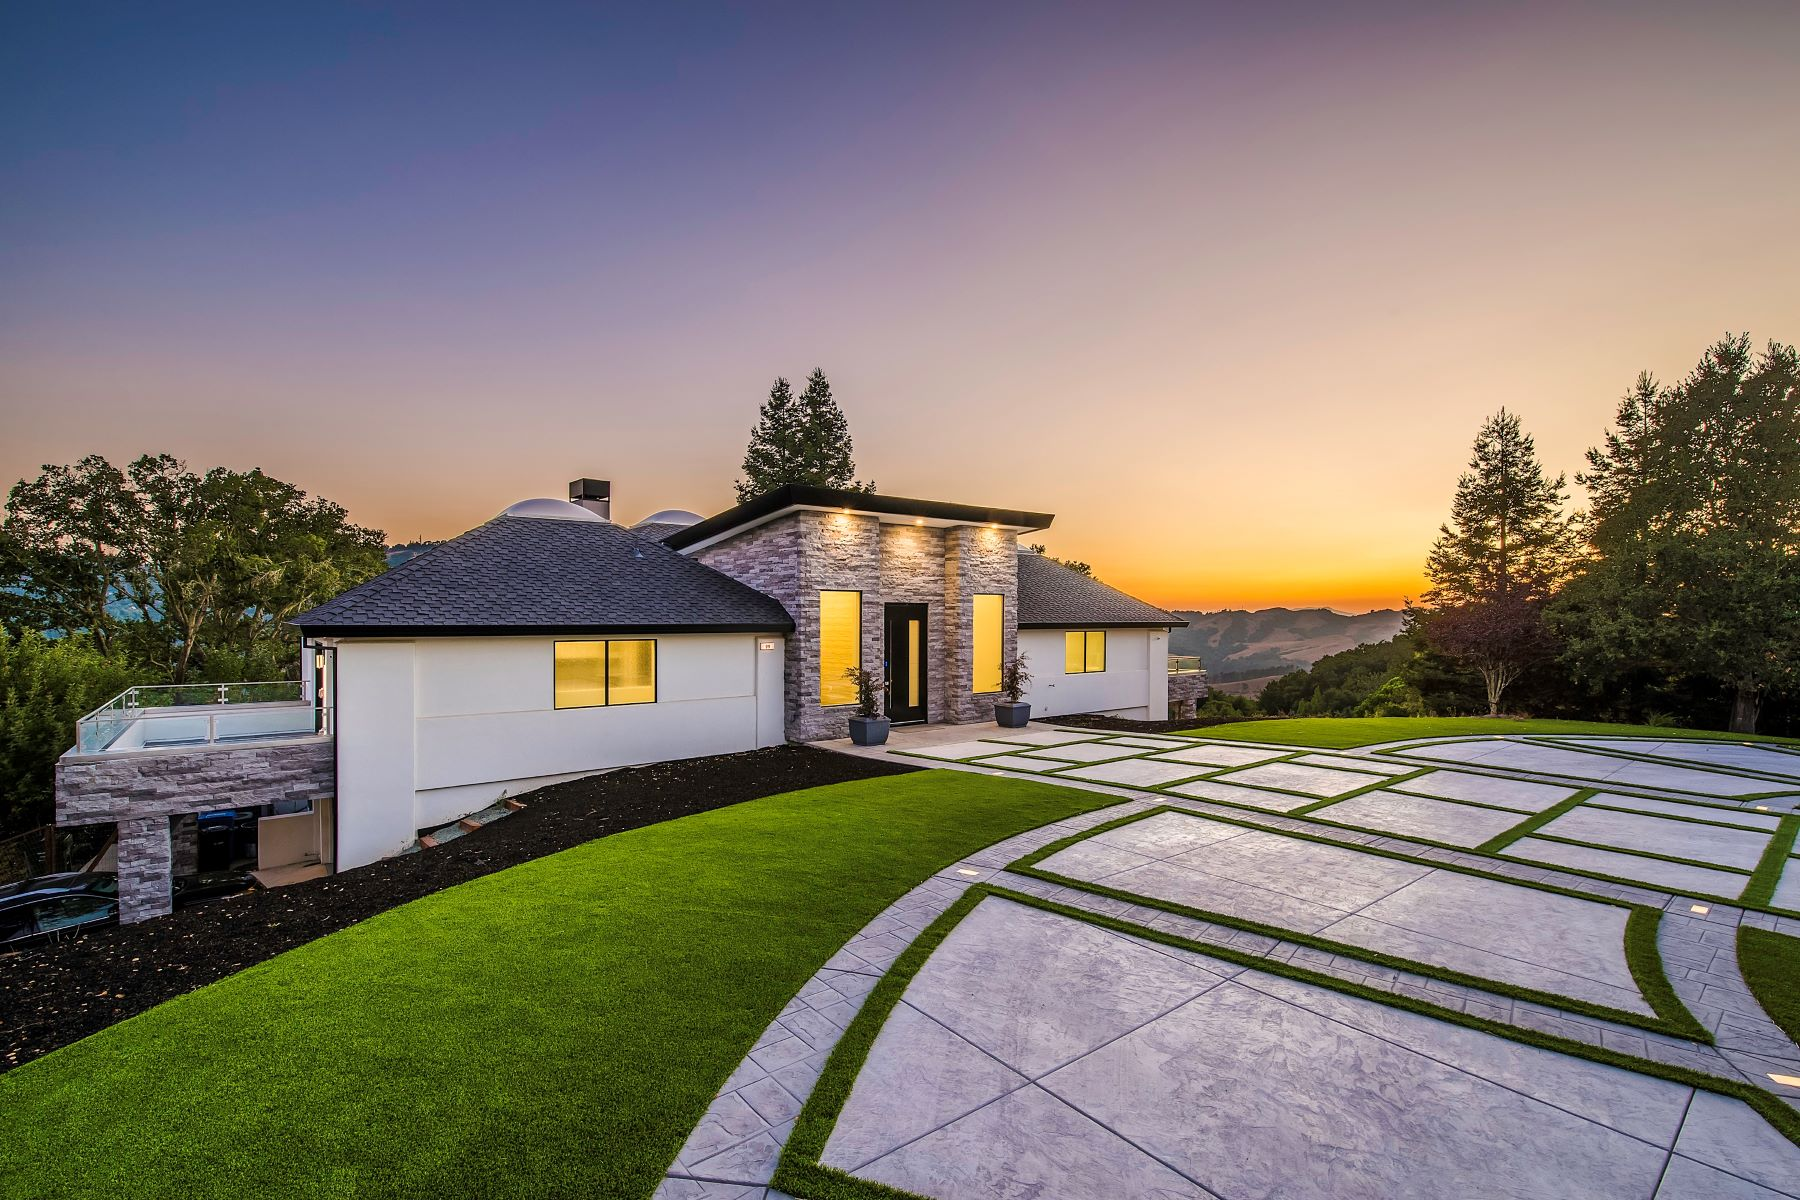 Single Family Homes for Sale at Stately Sleepy Hollow Estate 99 Tappan Lane Orinda, California 94563 United States